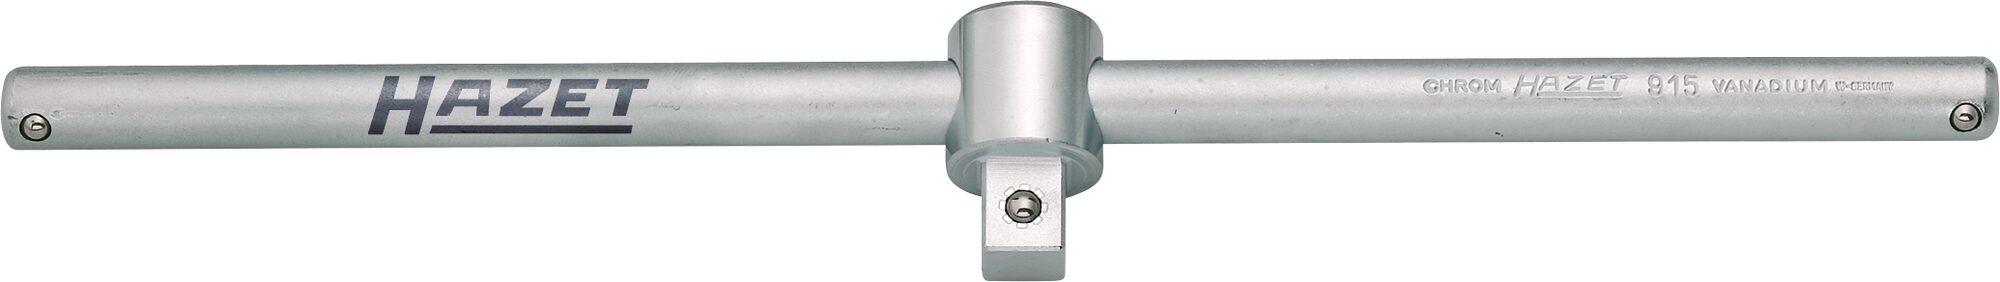 HAZET Quergriff 915 ∙ Vierkant massiv 12,5 mm (1/2 Zoll)